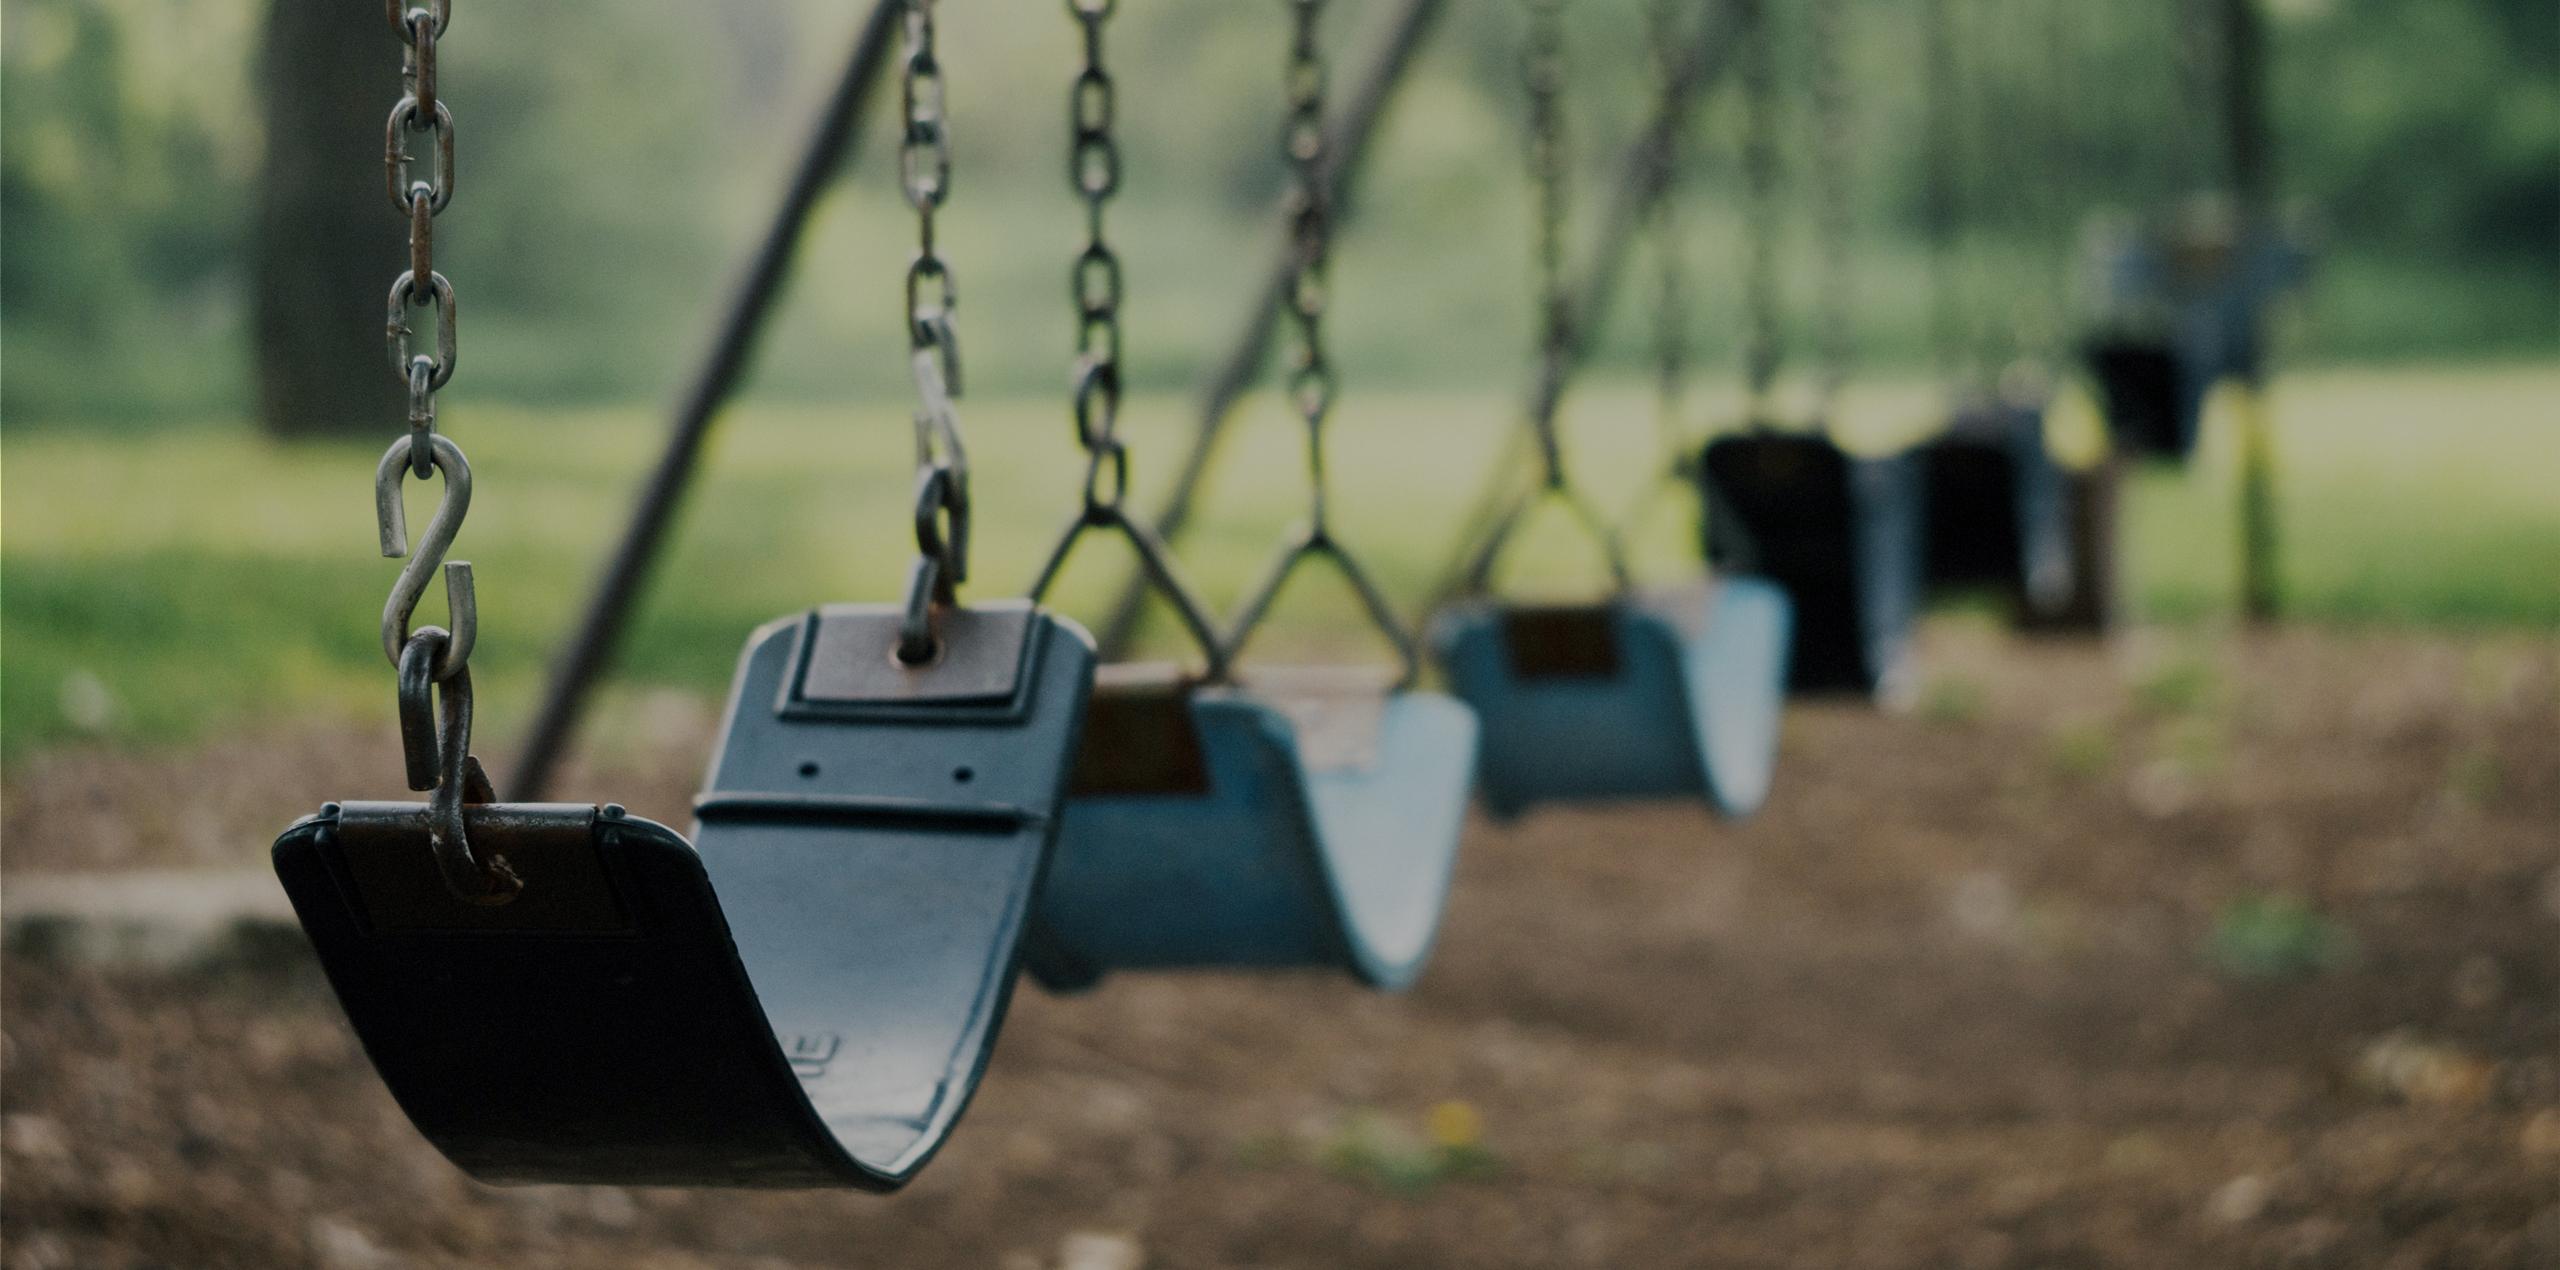 colomer-nou-parc-fundicion-mobiliario-urbano-parques-infantiles-restauracion-slider-home-columpios